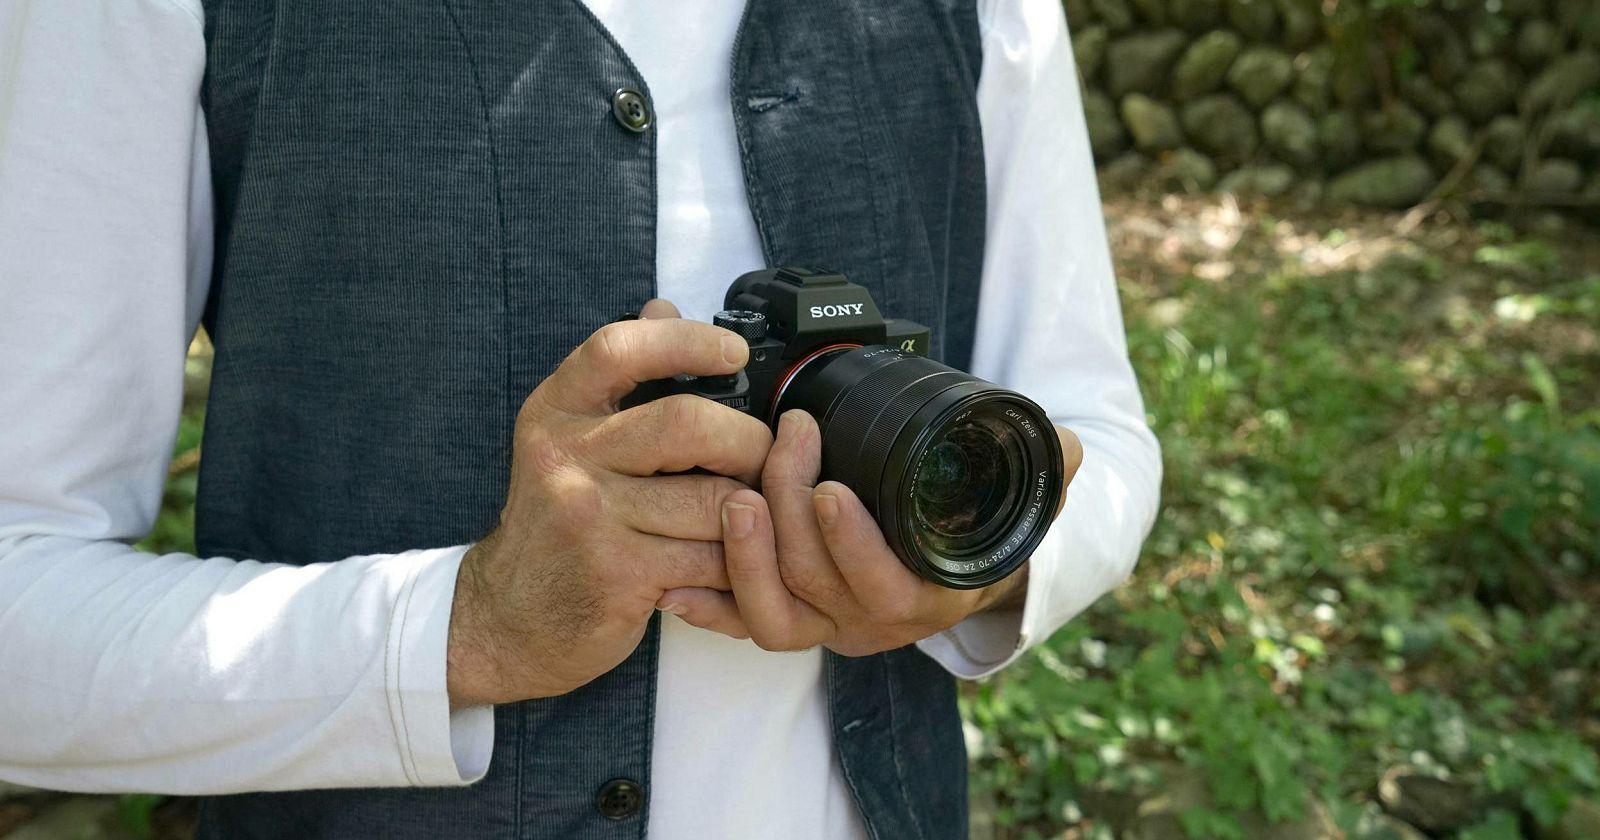 Sony Alpha a7R II Body Mirrorless Digital Camera bezrcalni digitalni  fotoaparat tijelo Full Frame a7RII Mk II 42MP UHD 4K ILCE-7RM2B ILCE7RM2B